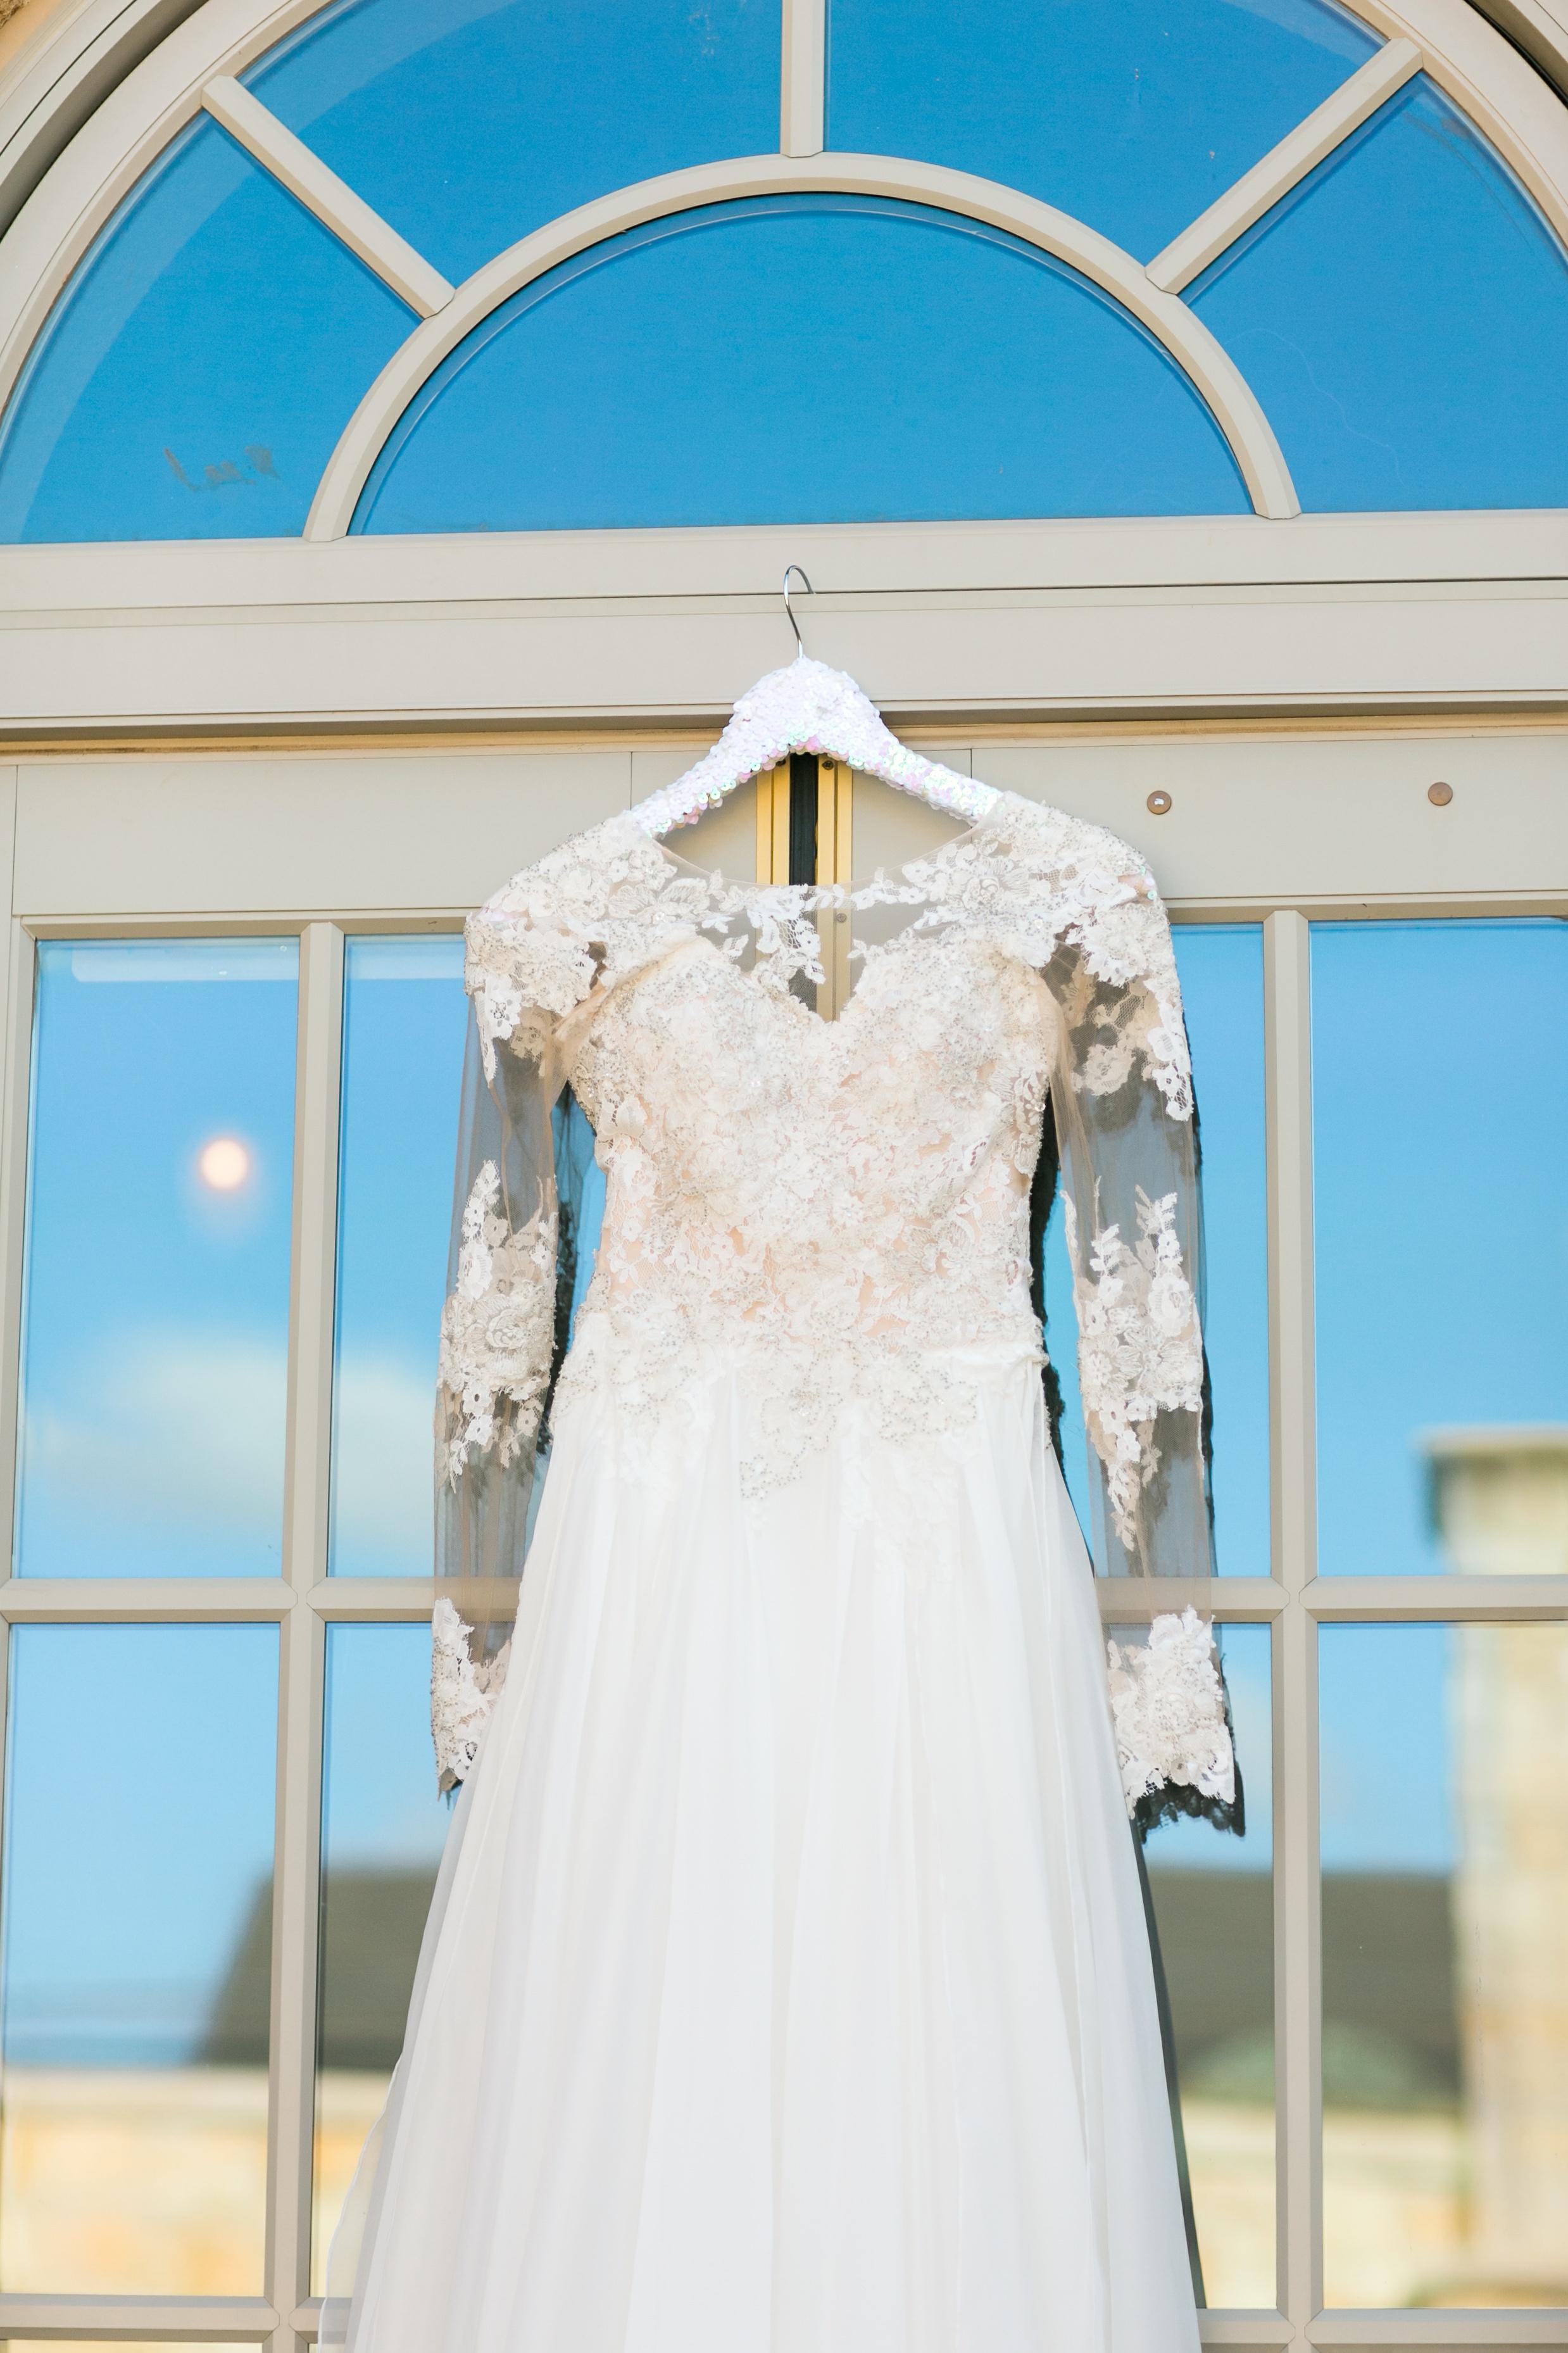 Roberson-Wedding-The-Forum-Lauren-Pinson-Wedding-Photography-Wichita-Falls-Texas-002.jpg